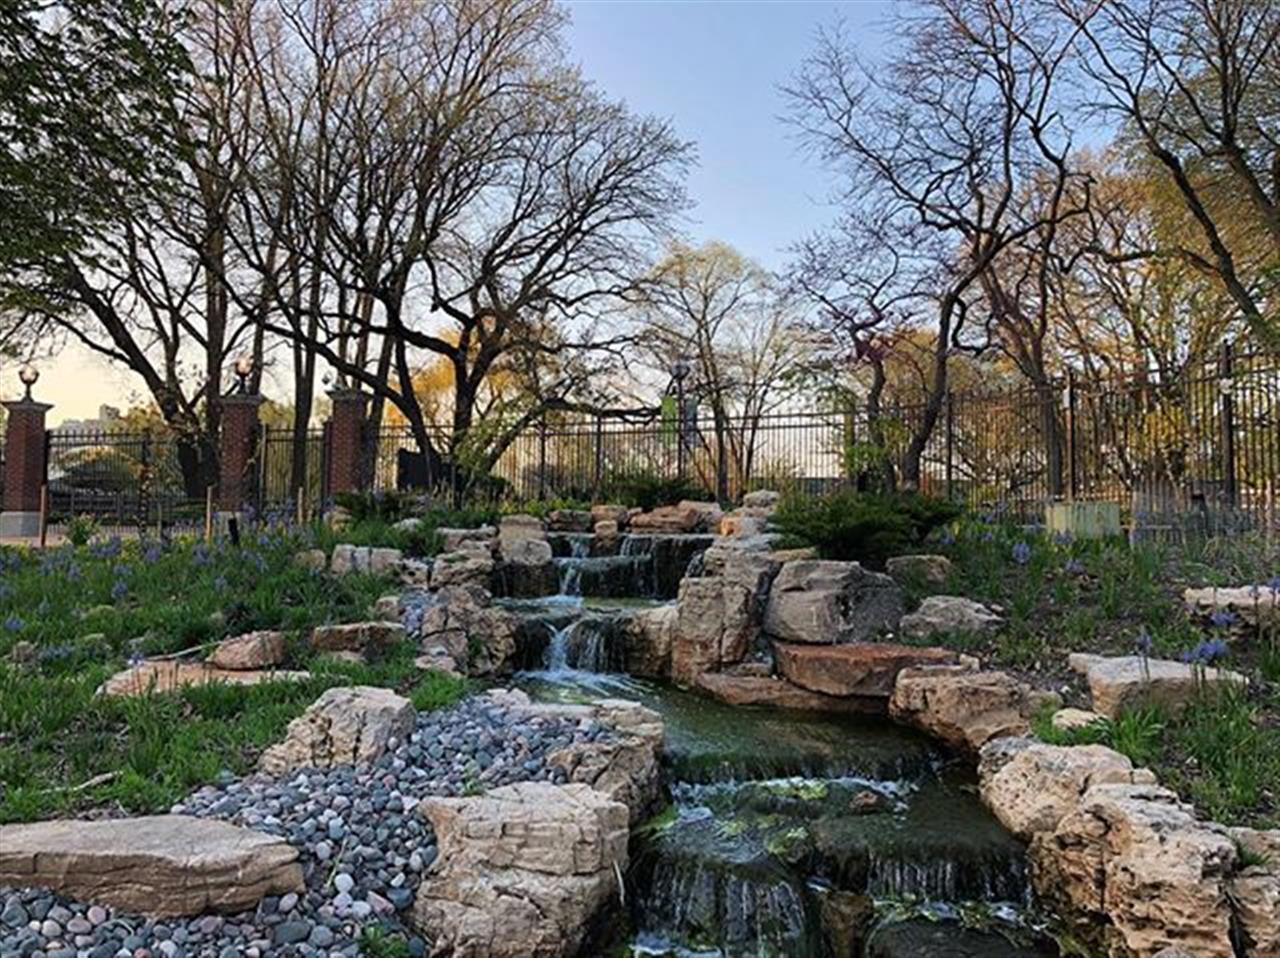 Evening walk through ChicagoÔÇÖs Lincoln Park neighborhood. .. .. .. #chicago #lincolnpark #waterfall #greenspace #chicagoparks #leadingrelocal #bairdwarner #lincolnparkrealestate #chicagorealestate #evening #twilight #explore #exploreyourcity